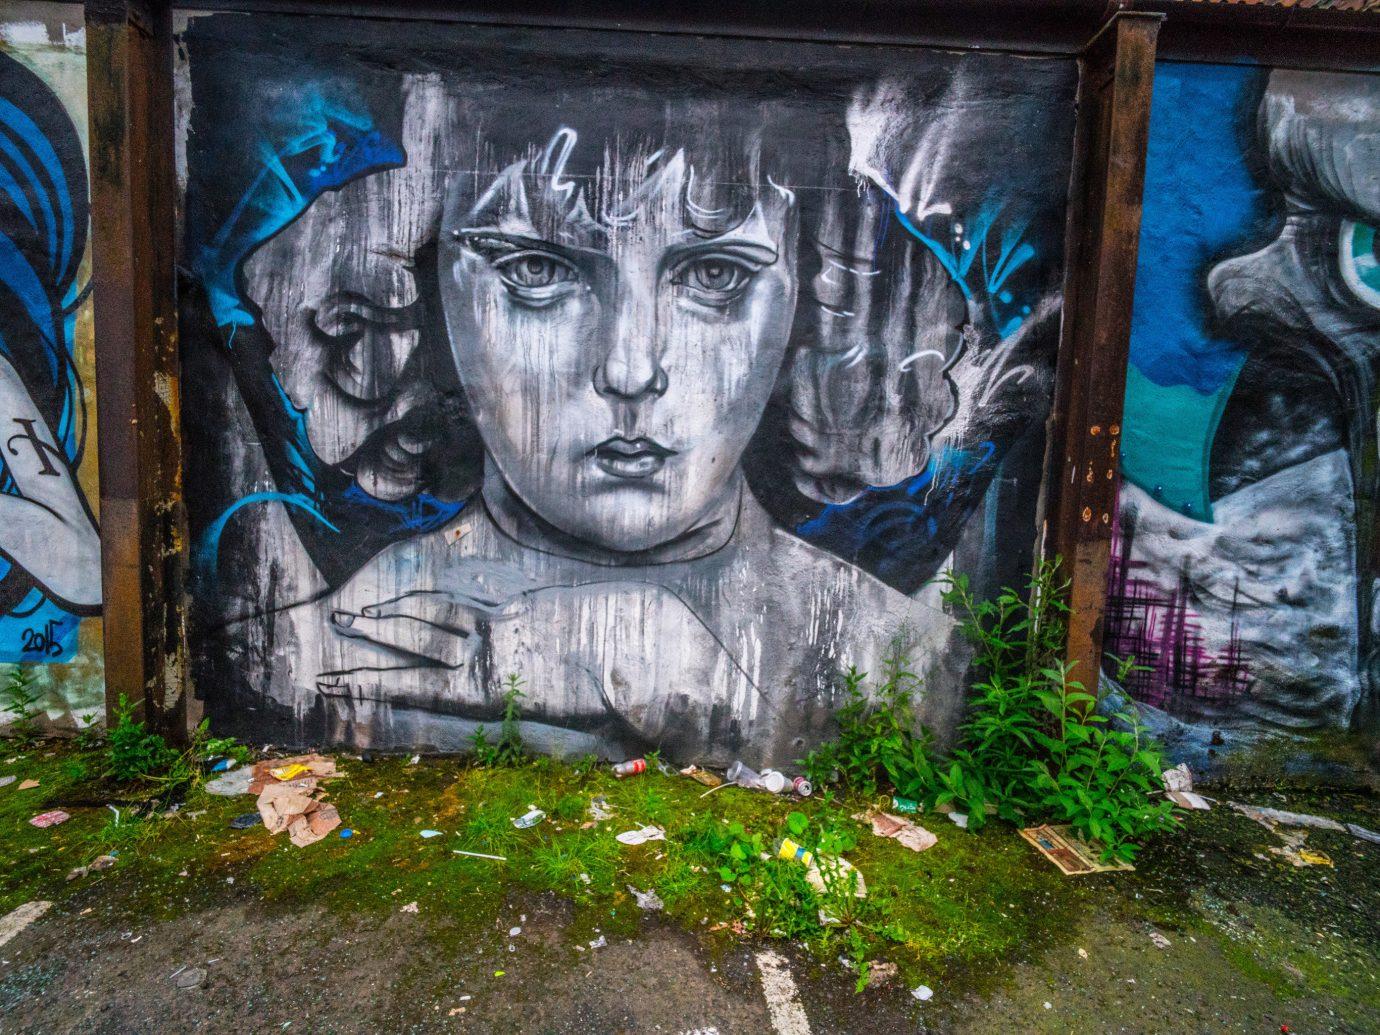 Trip Ideas graffiti outdoor art urban area street art abstract mural painted painting